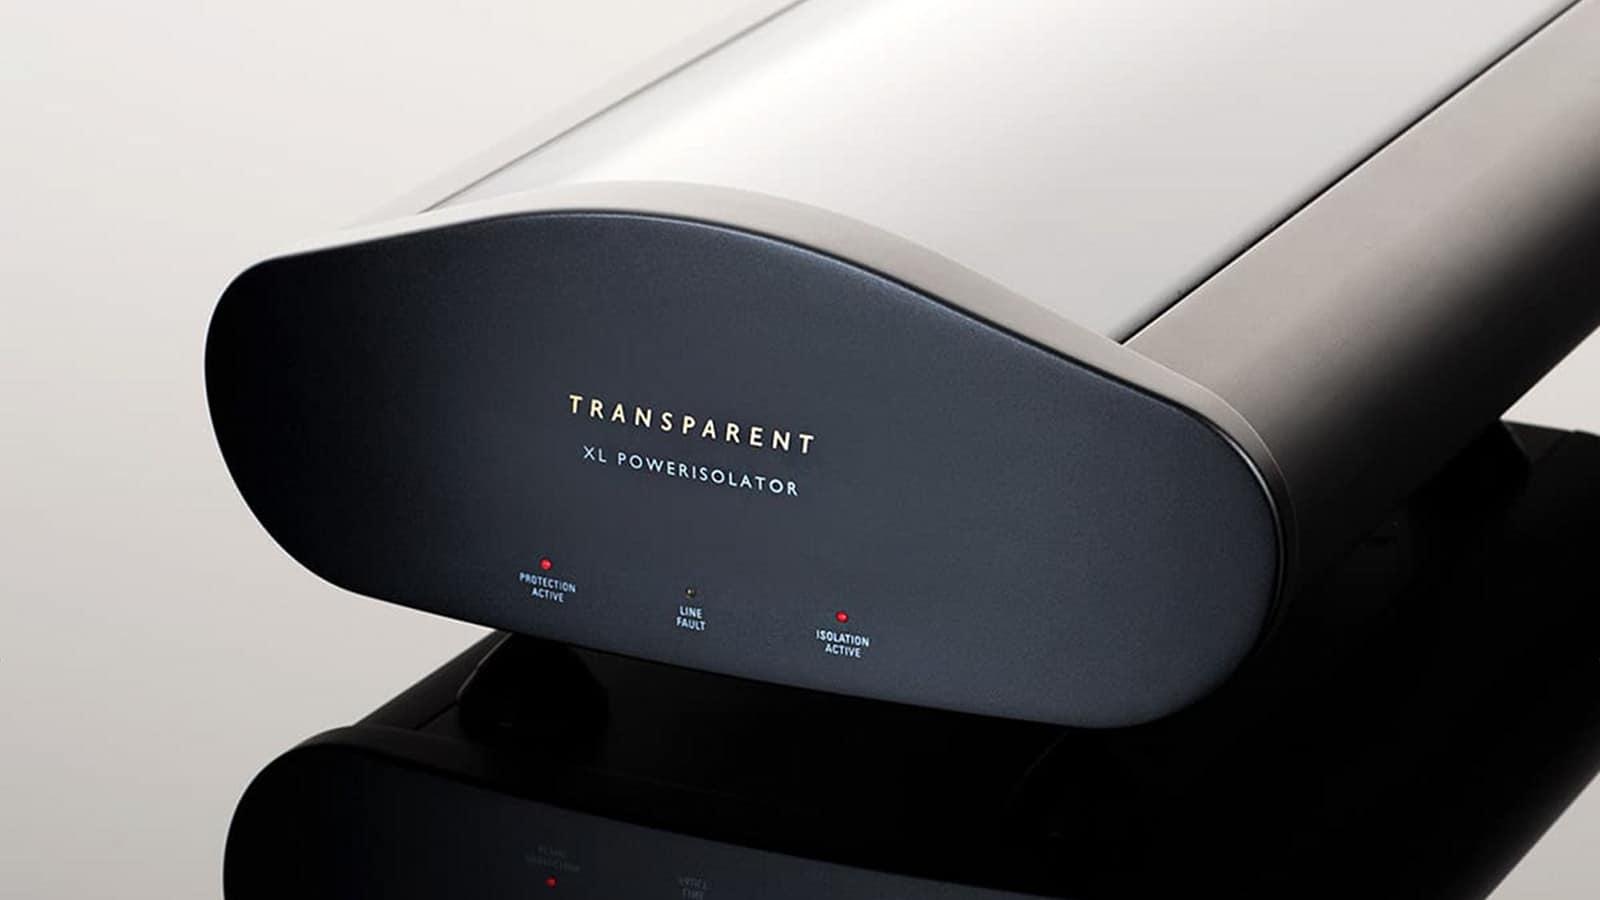 transparant-xl-powerisolator